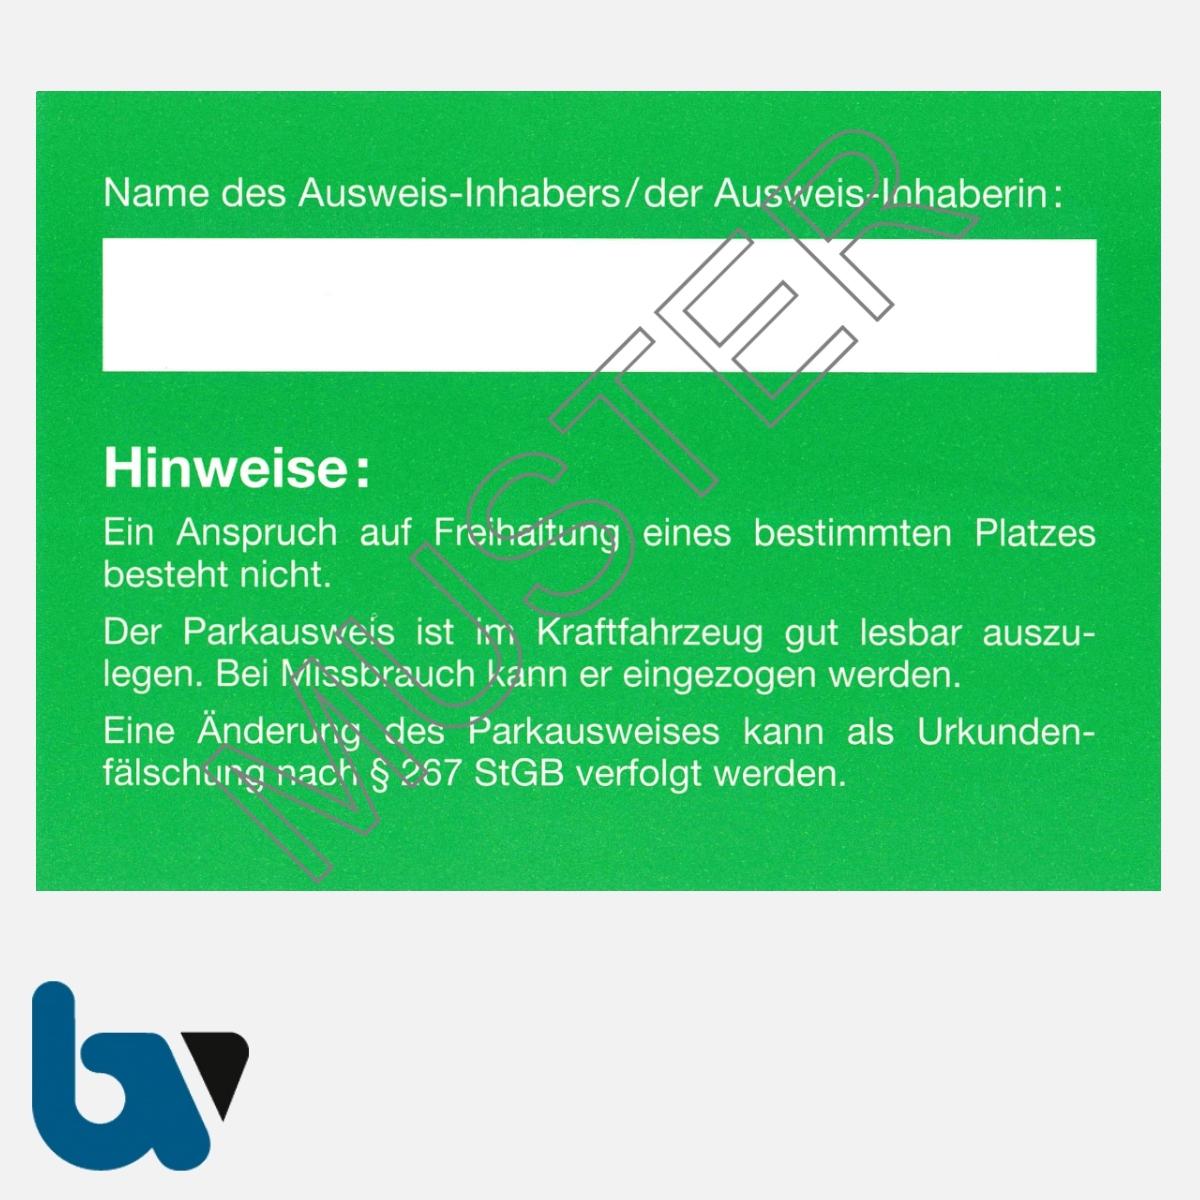 0/497-8 Bewohnerparkausweis amtlich Muster grün DIN A6 Karton RS   Borgard Verlag GmbH